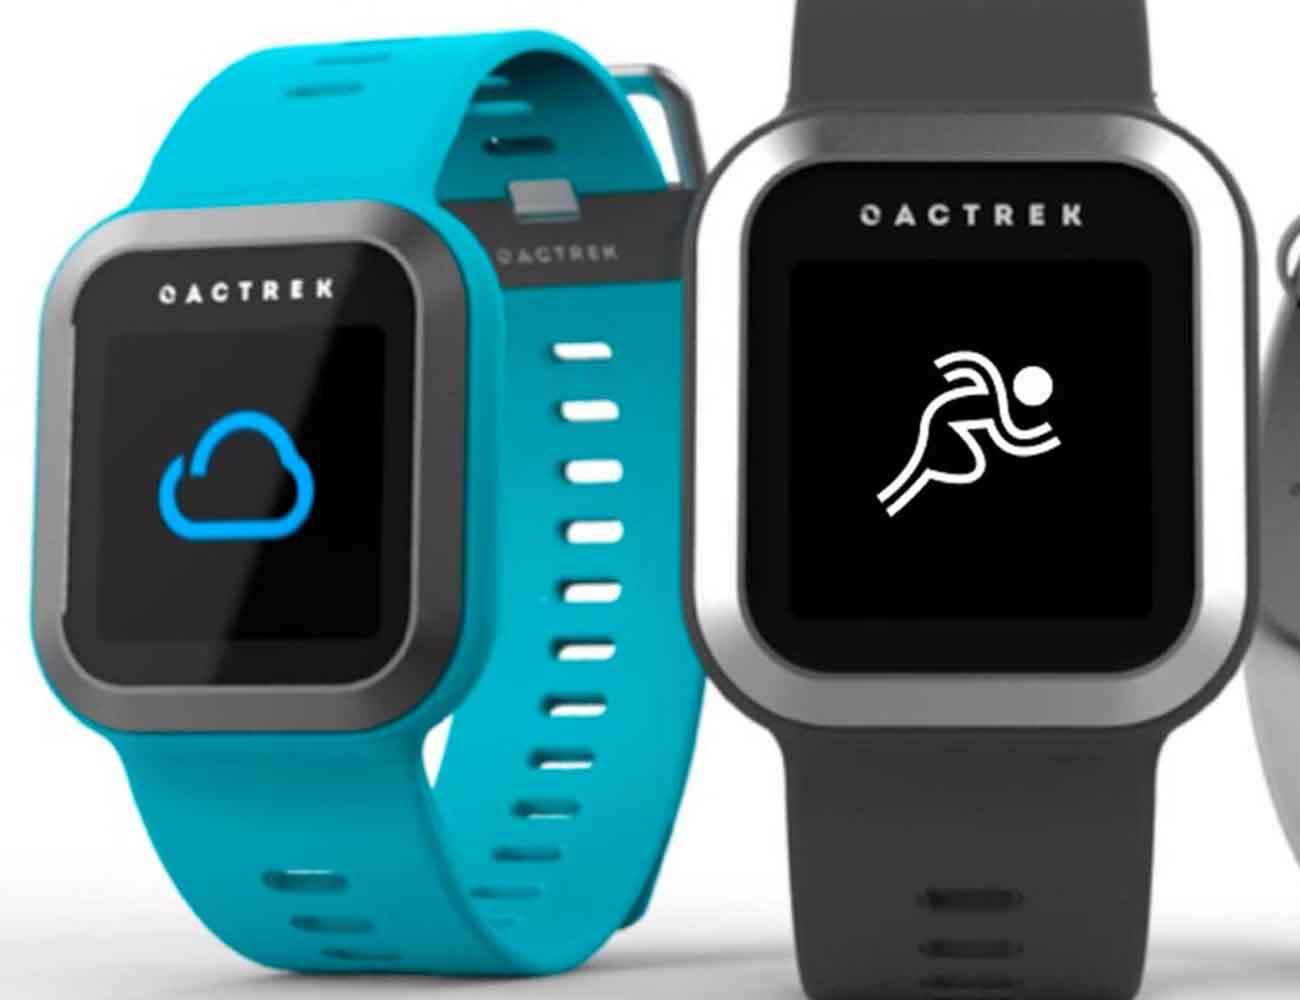 Actrek – The World's First Smart Fitness Wearable